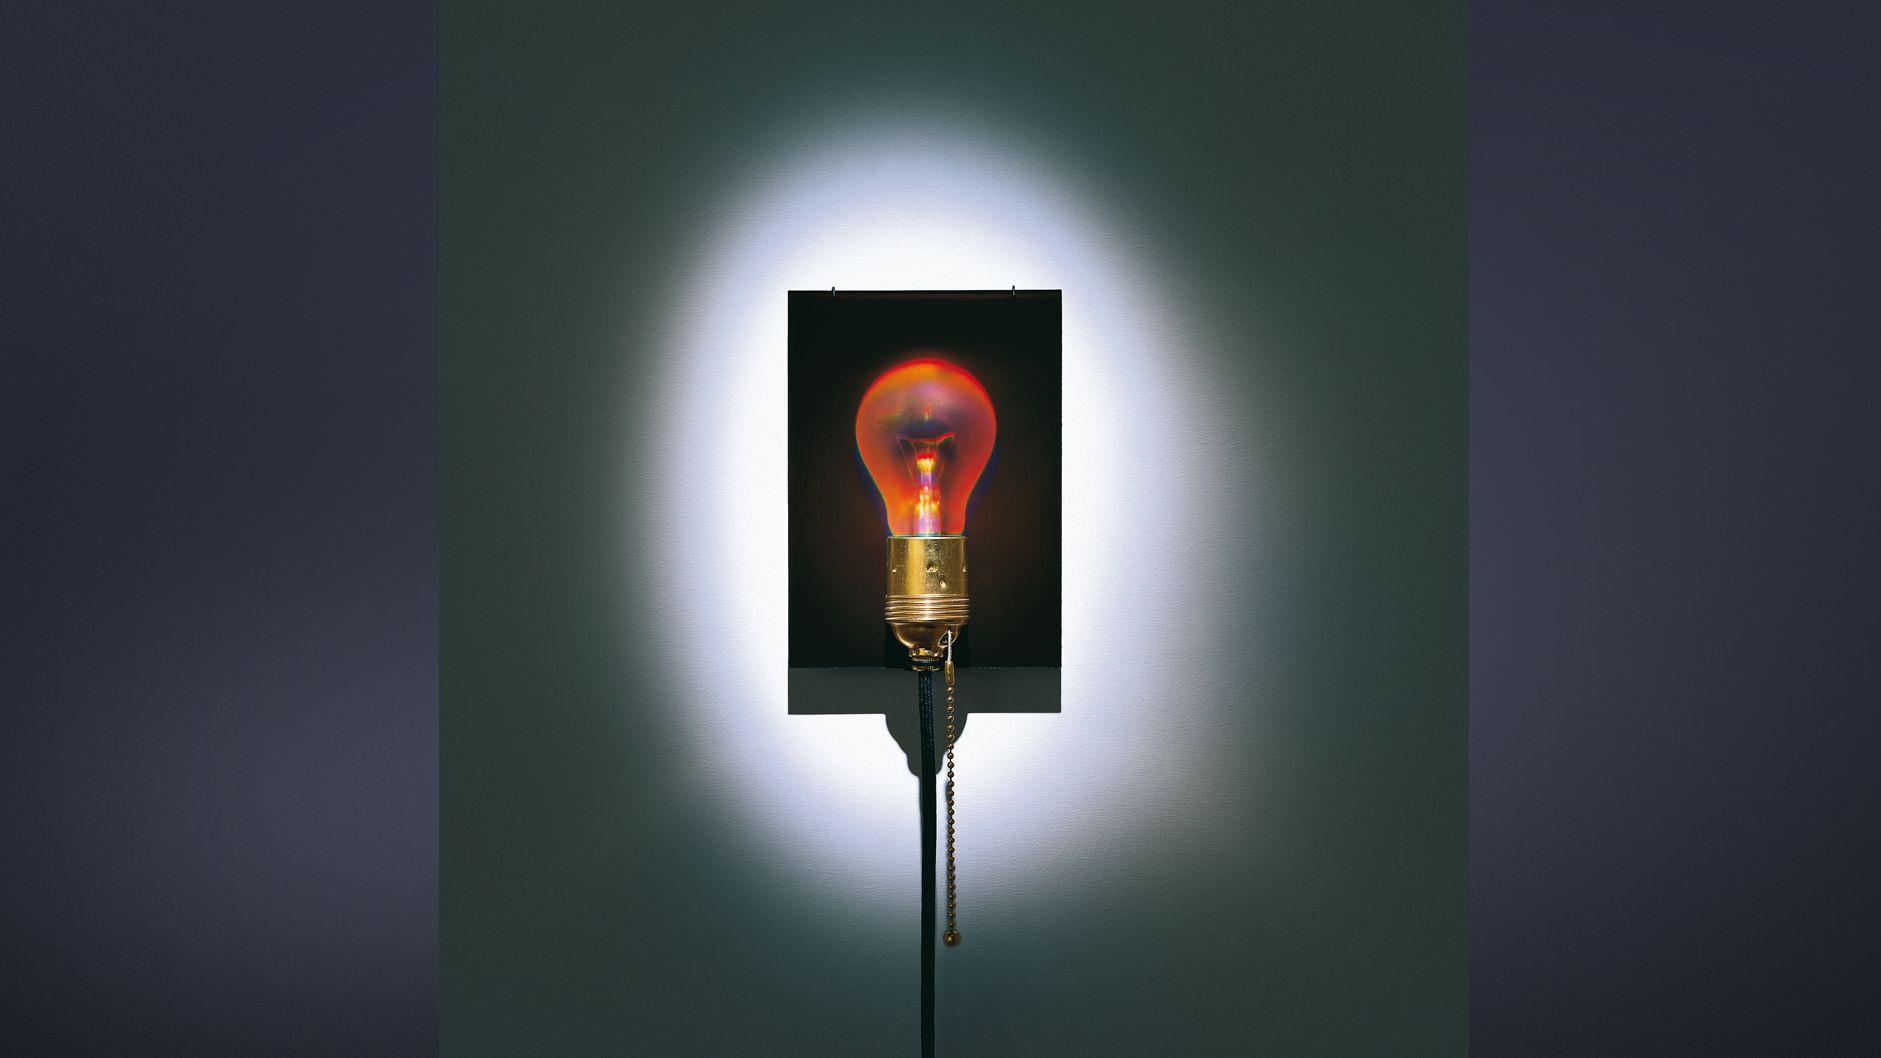 Eckhard Knuth, Ingo Maurer, Holonzki / Dead Bulb Alive, 2000.